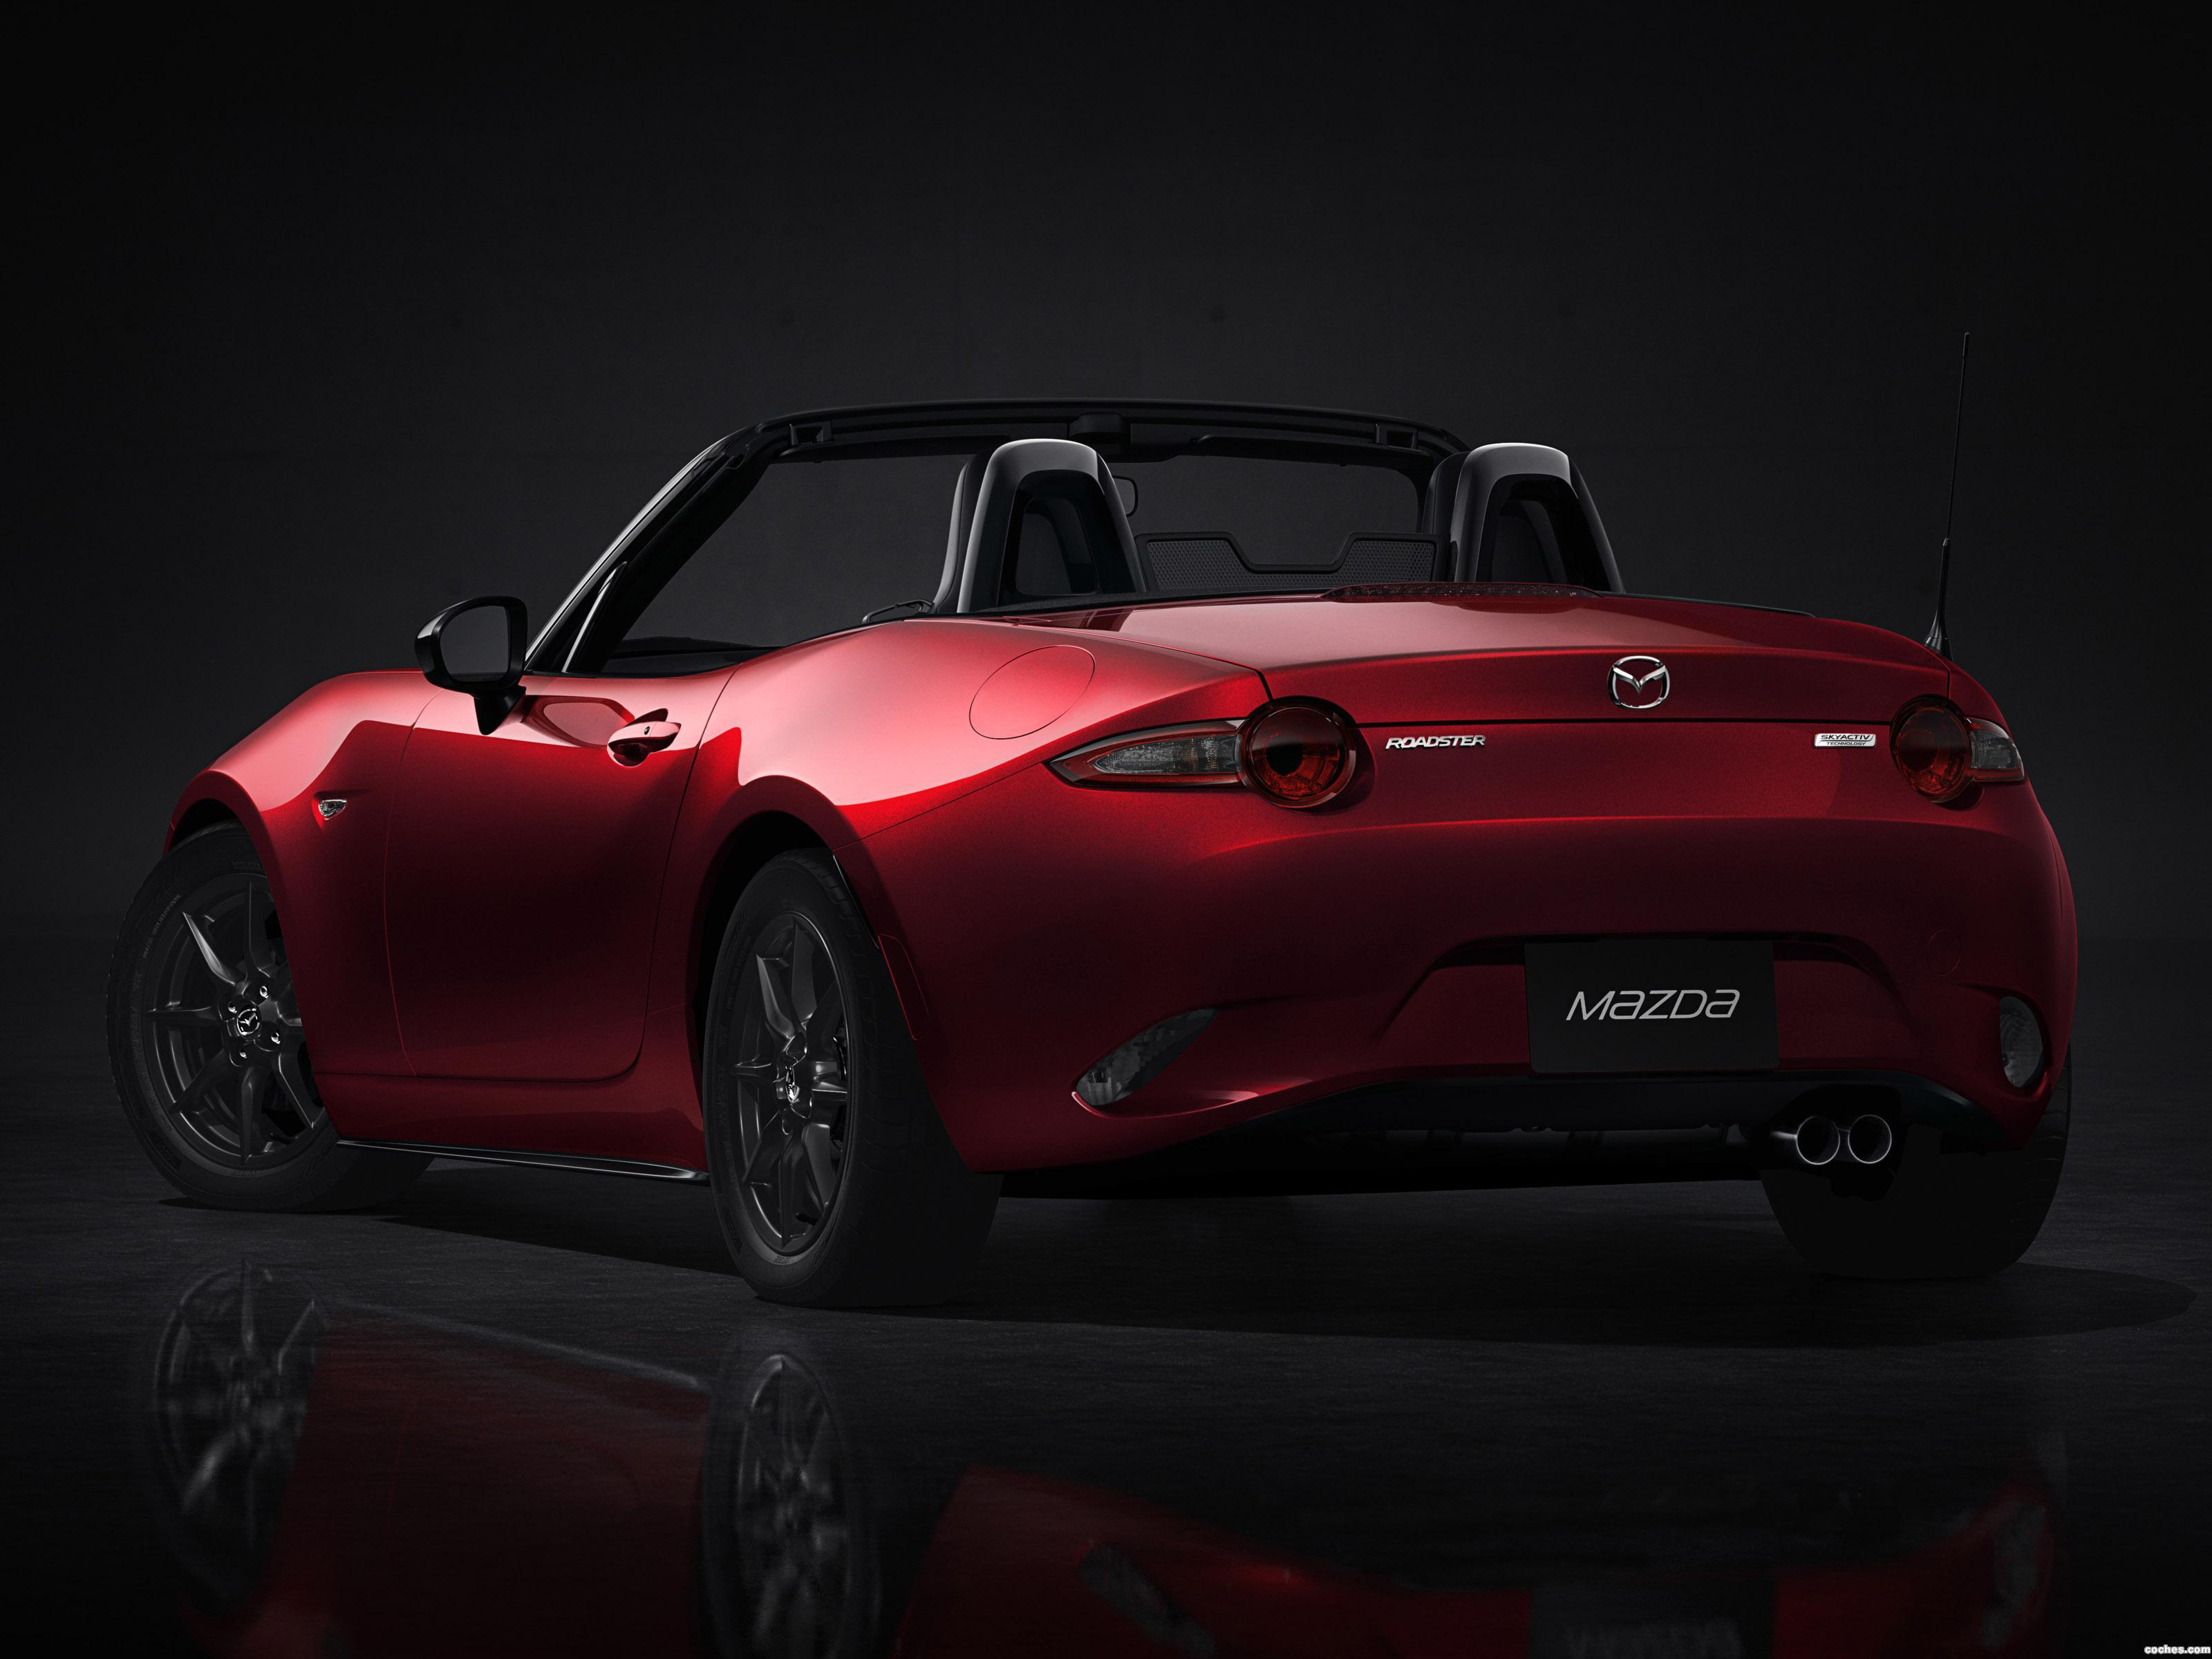 Foto 3 de Mazda MX-5 Roadster 2015